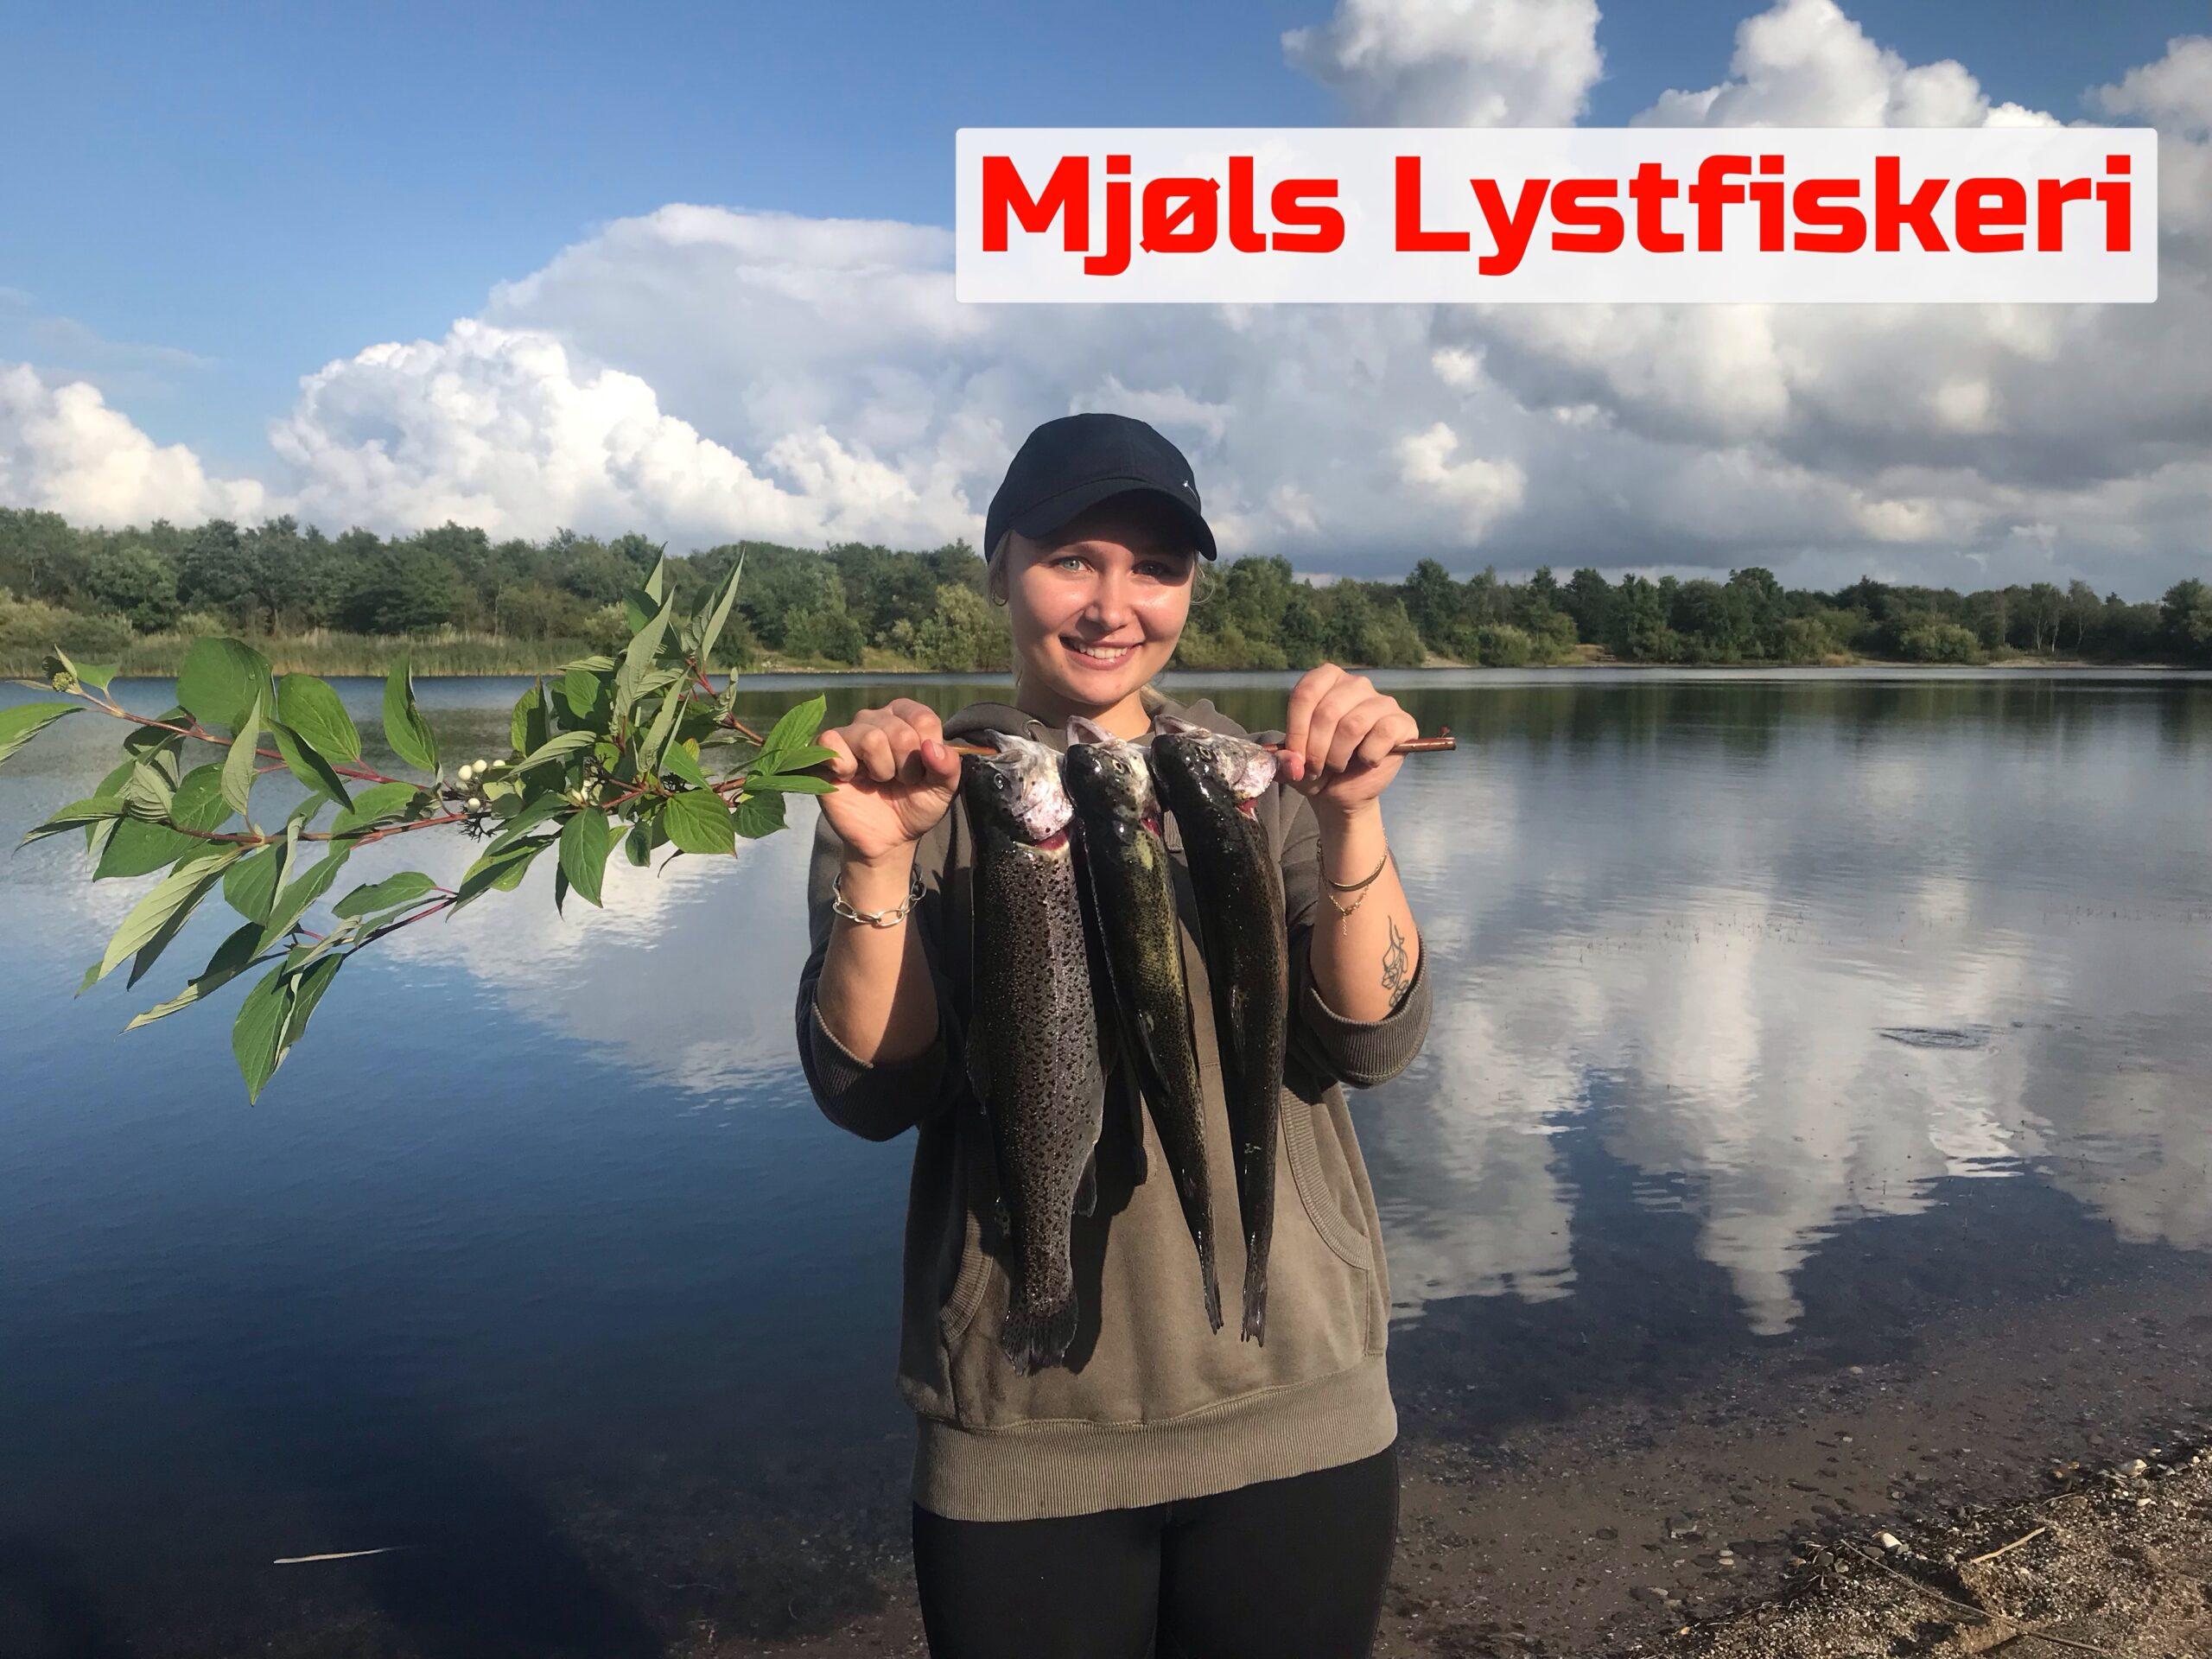 Flittig lystfisker fangede ørrederne på PowerBait